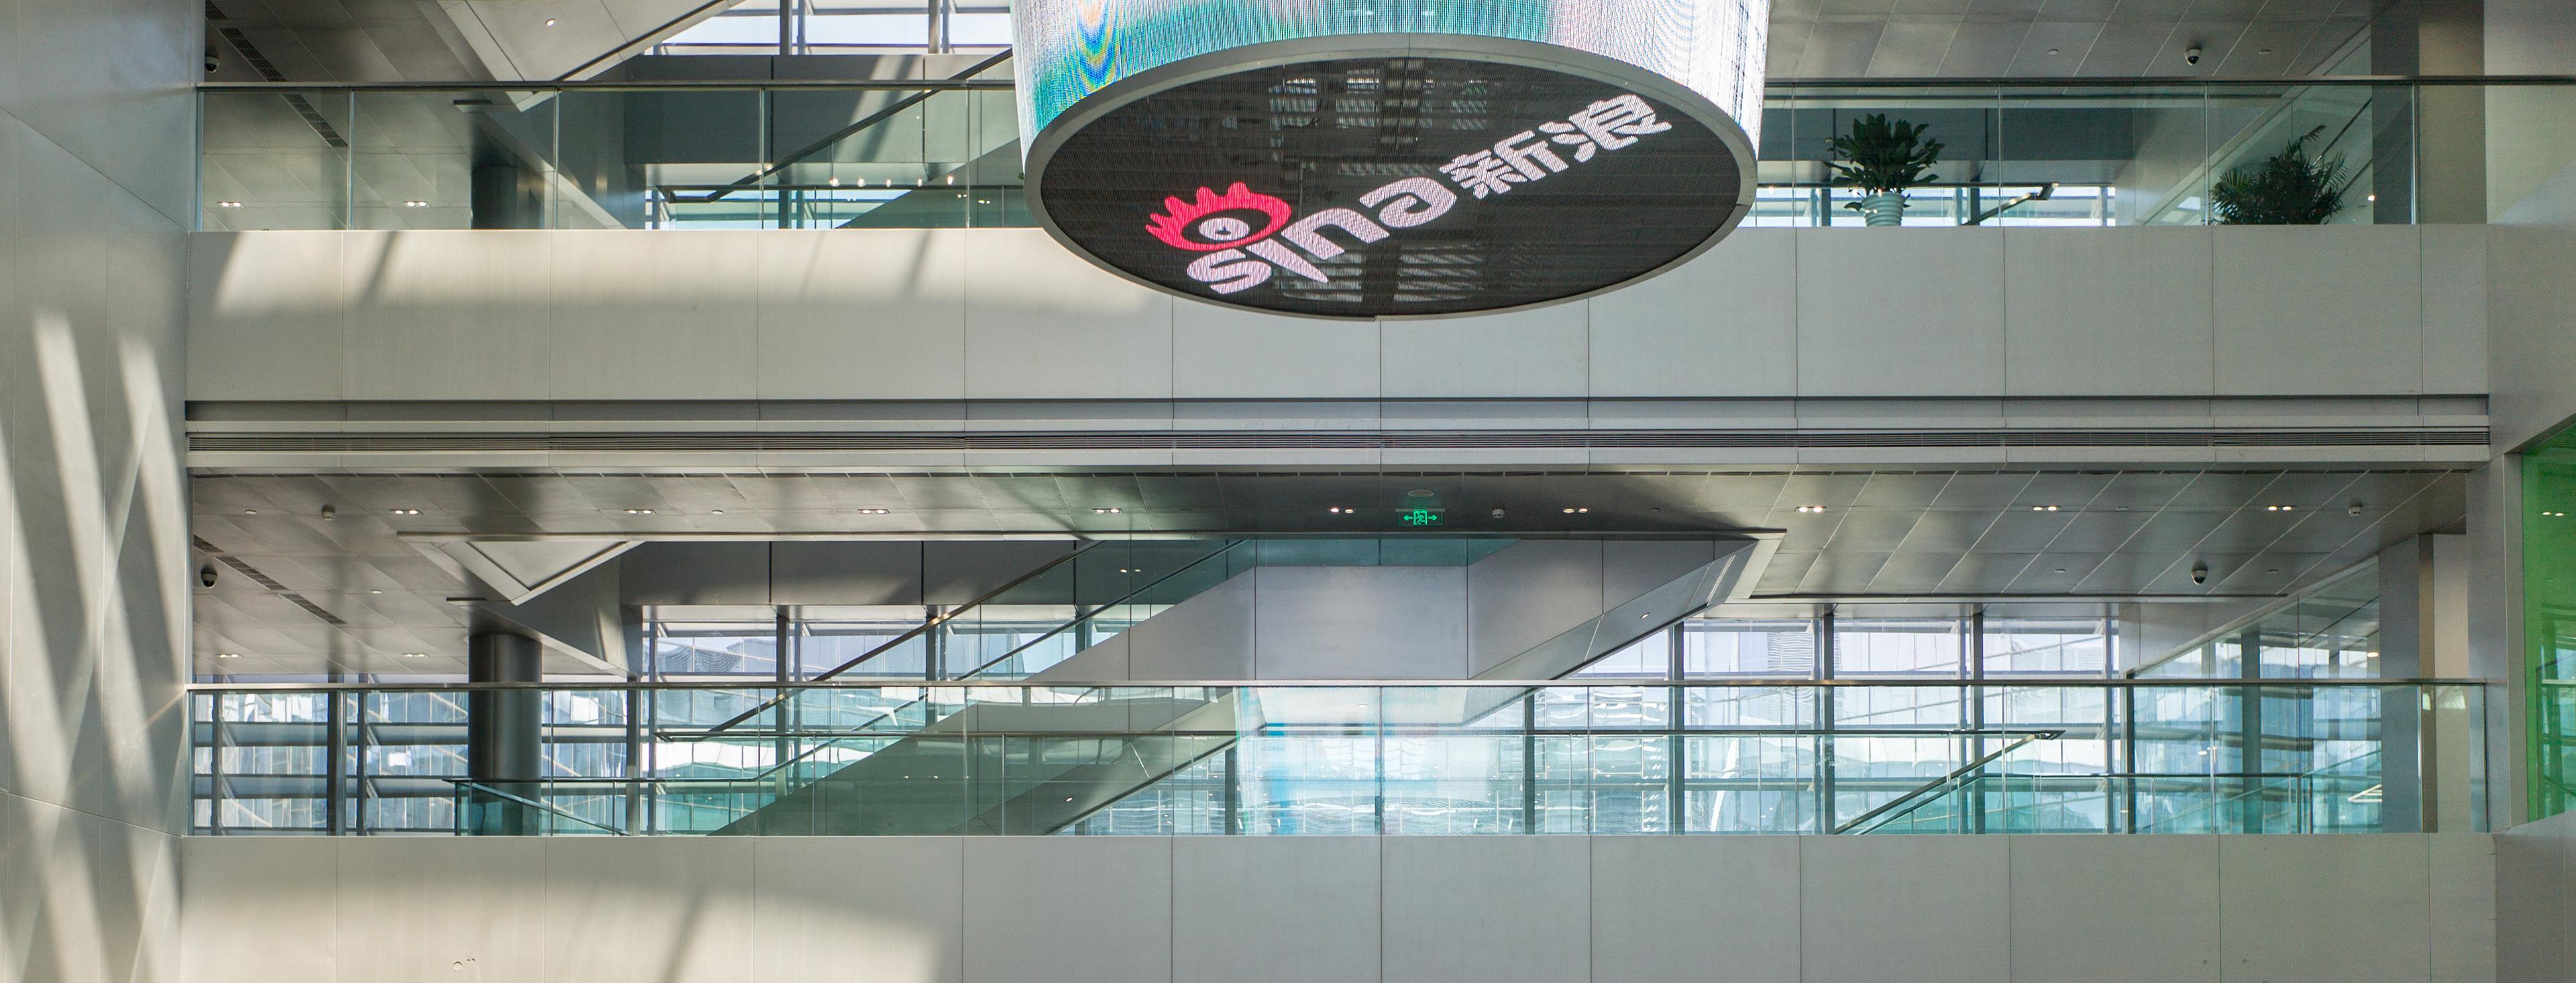 Sina erects new headquarters In Beijing